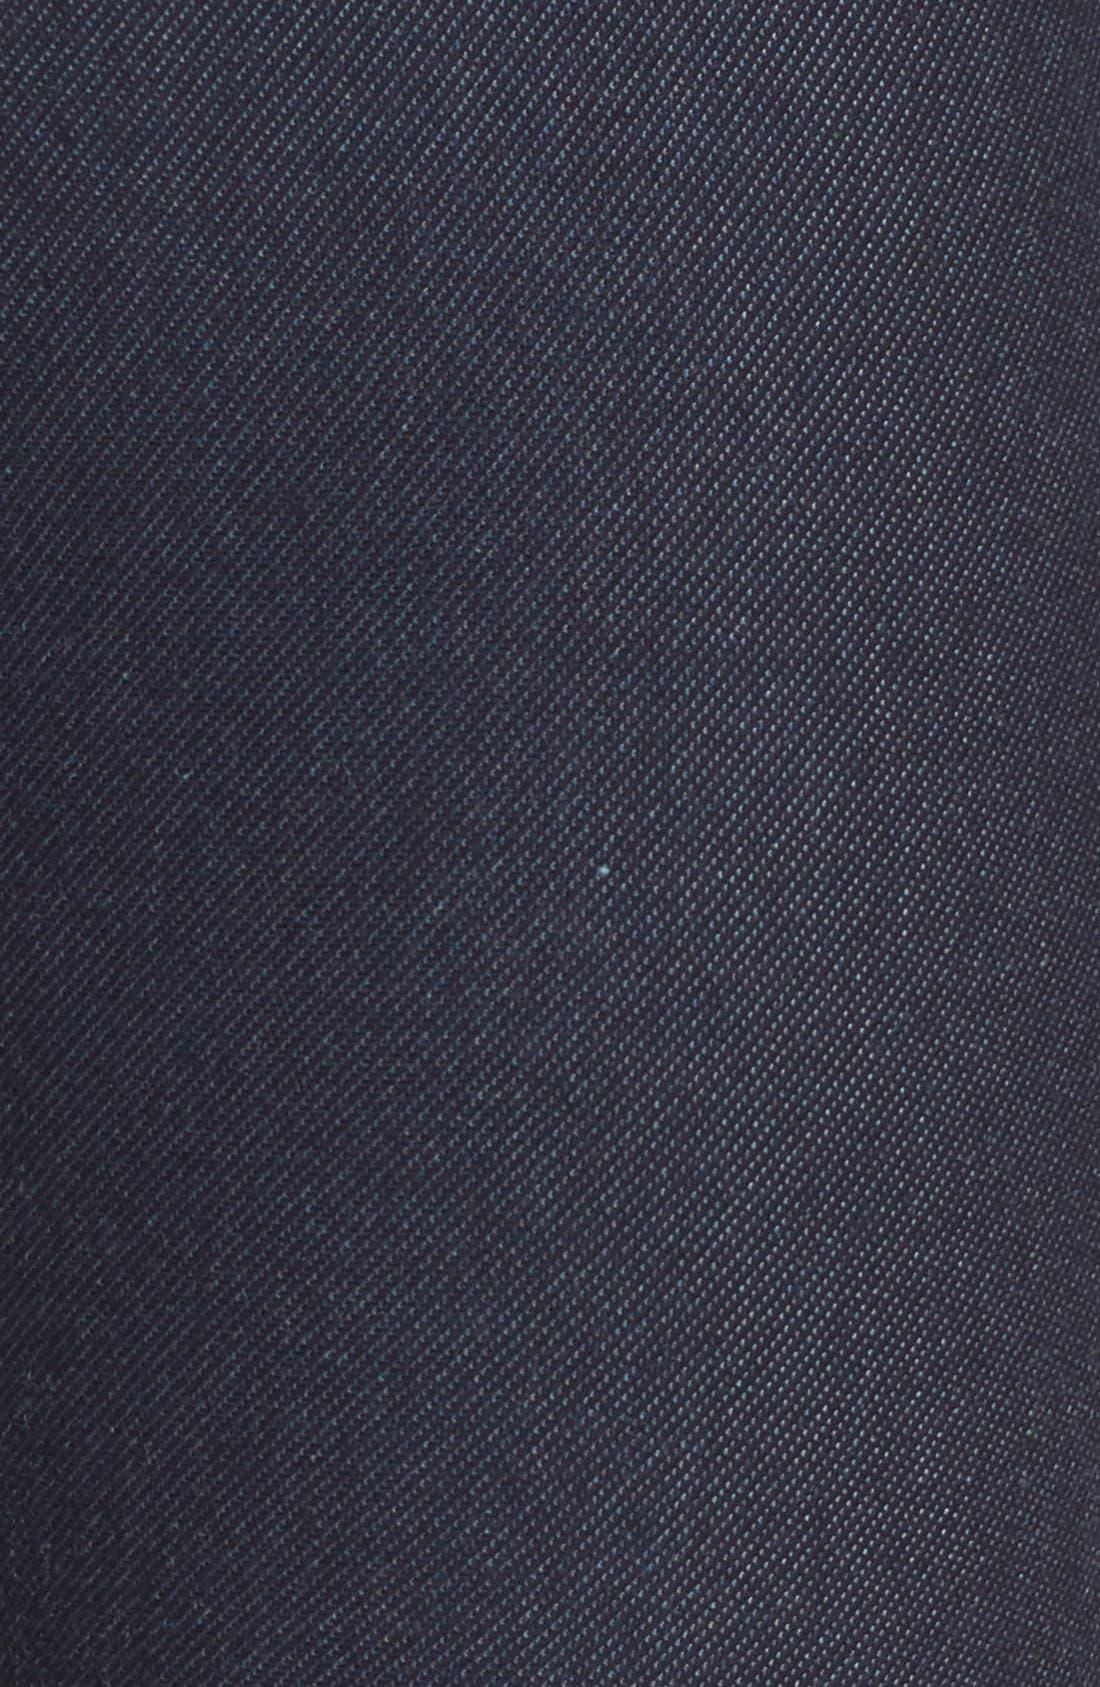 Denim Leggings,                             Alternate thumbnail 5, color,                             Deep Indigo